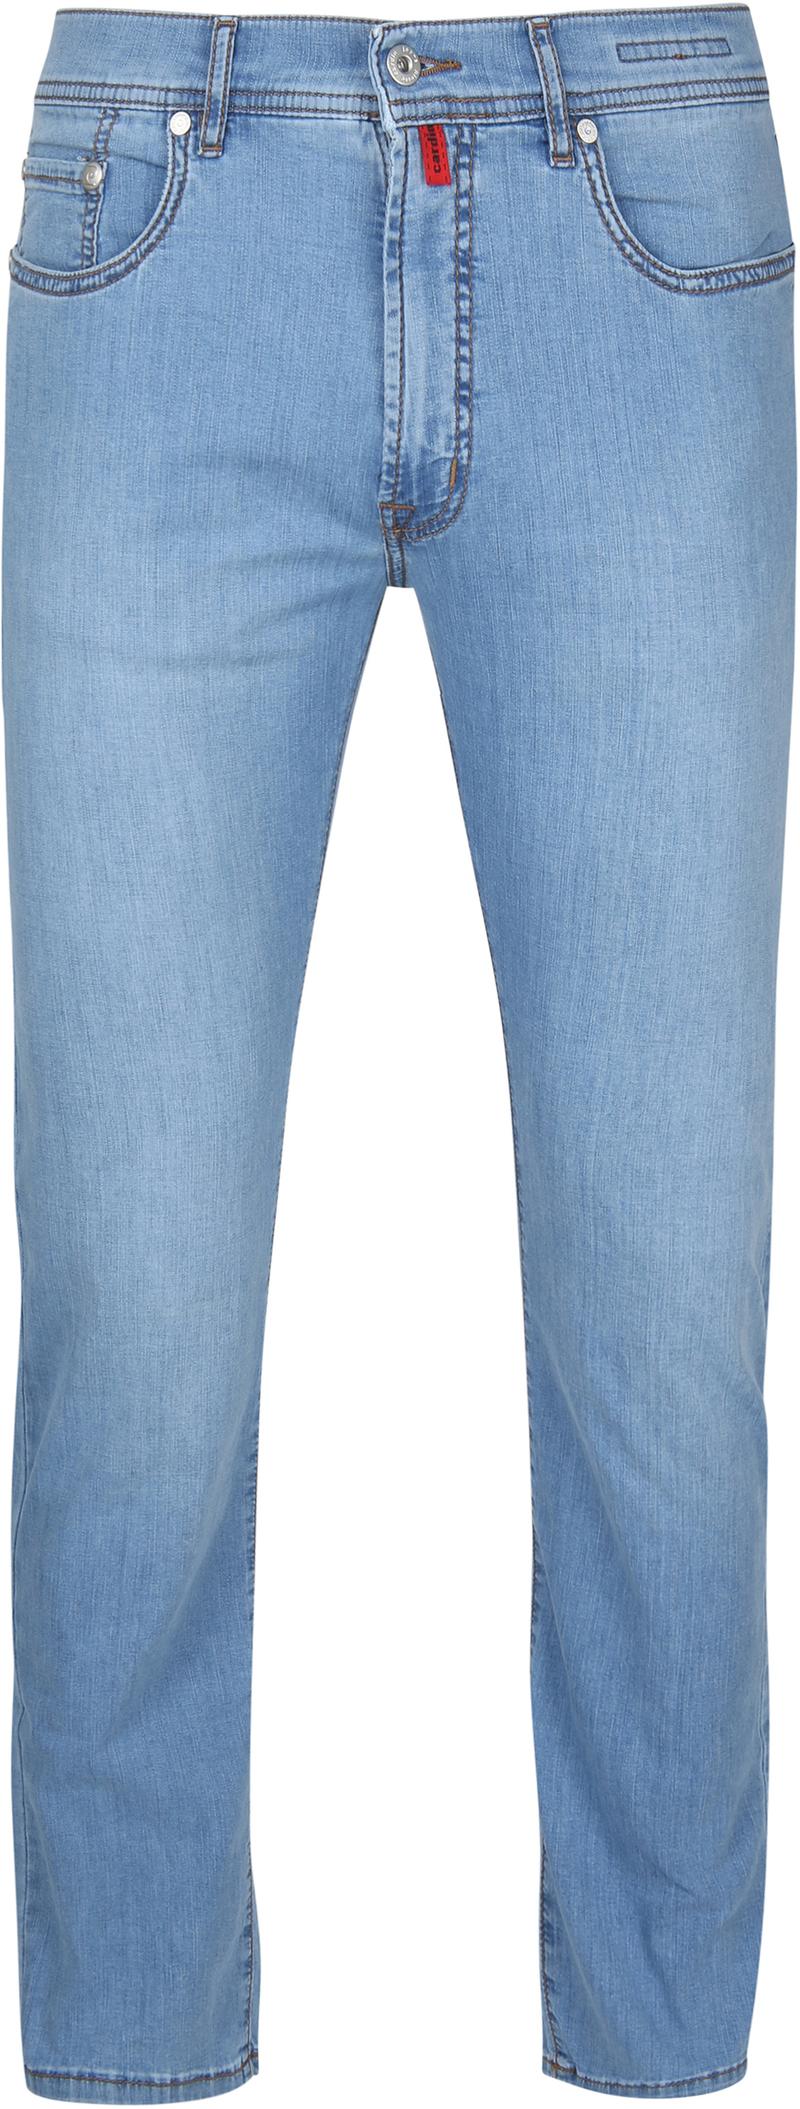 Pierre Cardin Jeans Lyon Airtouch Blue photo 0